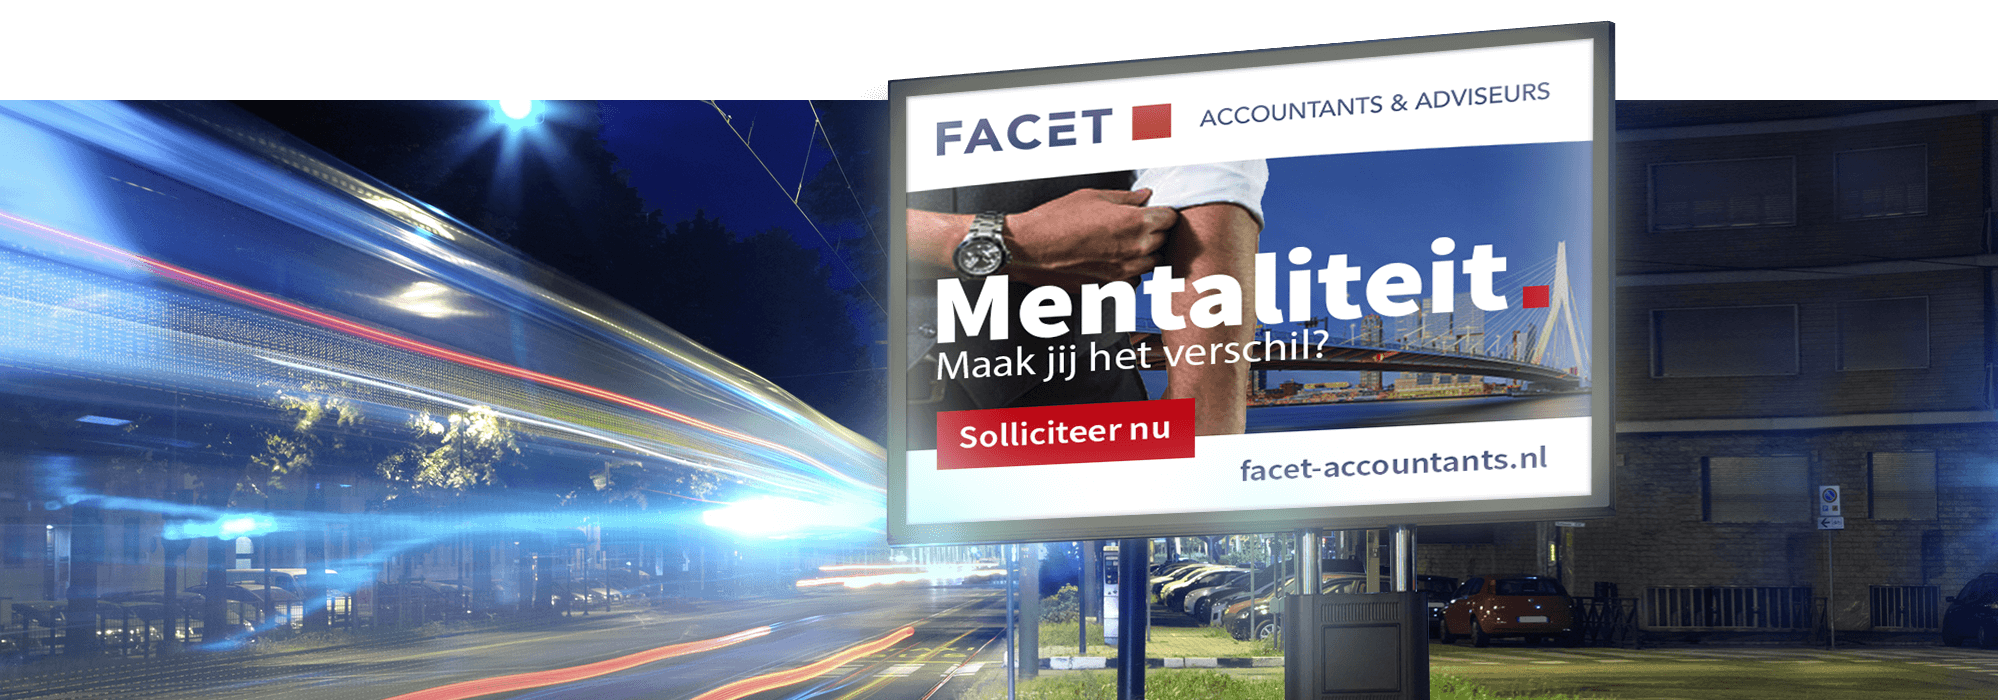 arbeidsmarktcommunicatie_facet_02